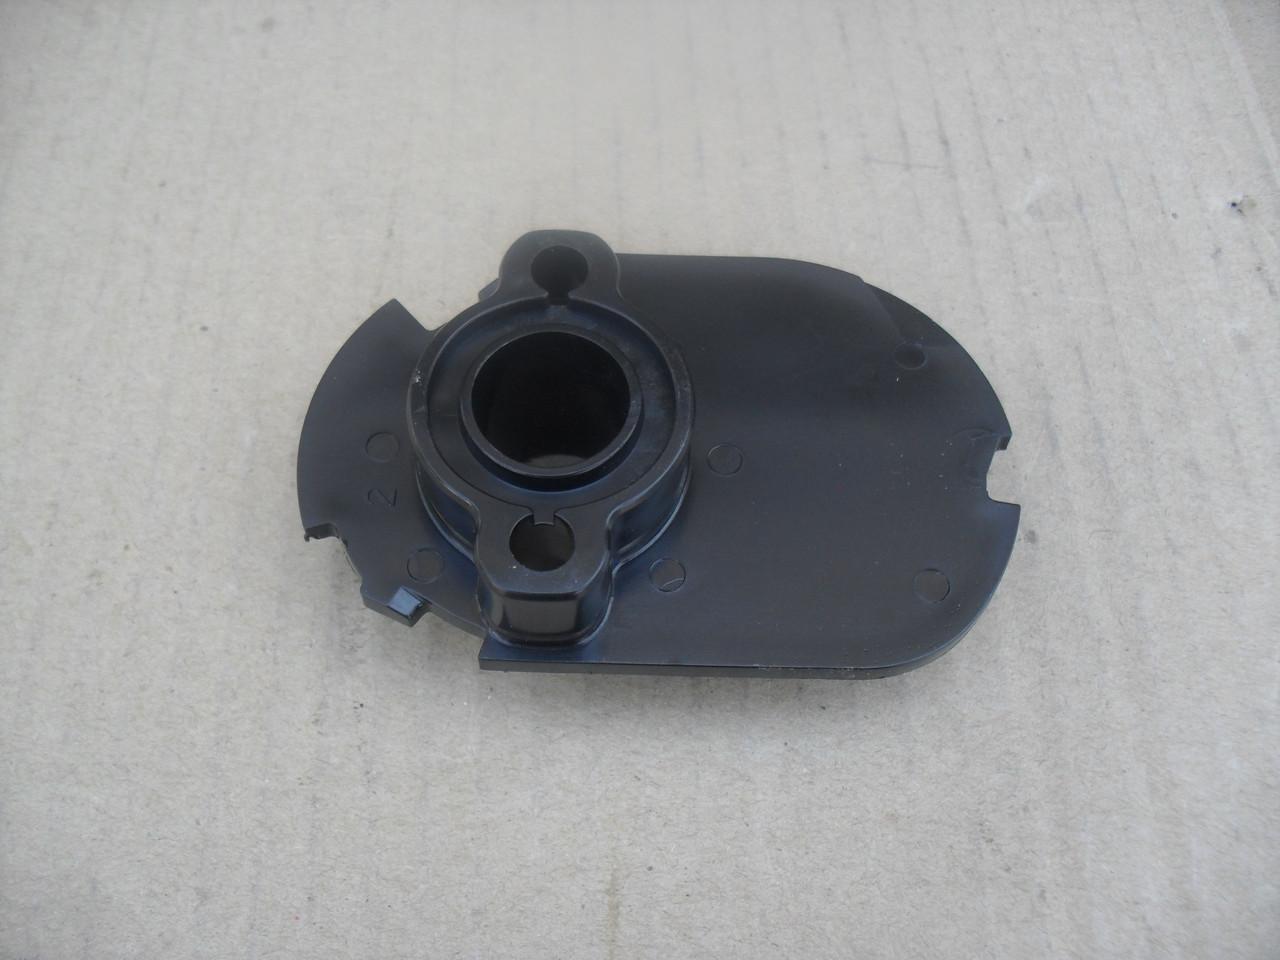 Tecumseh Collar 36919 Air Filter Cover Back Plate LEV105, LEV115, LEV120, LV195EA, LV195XA, TVS120